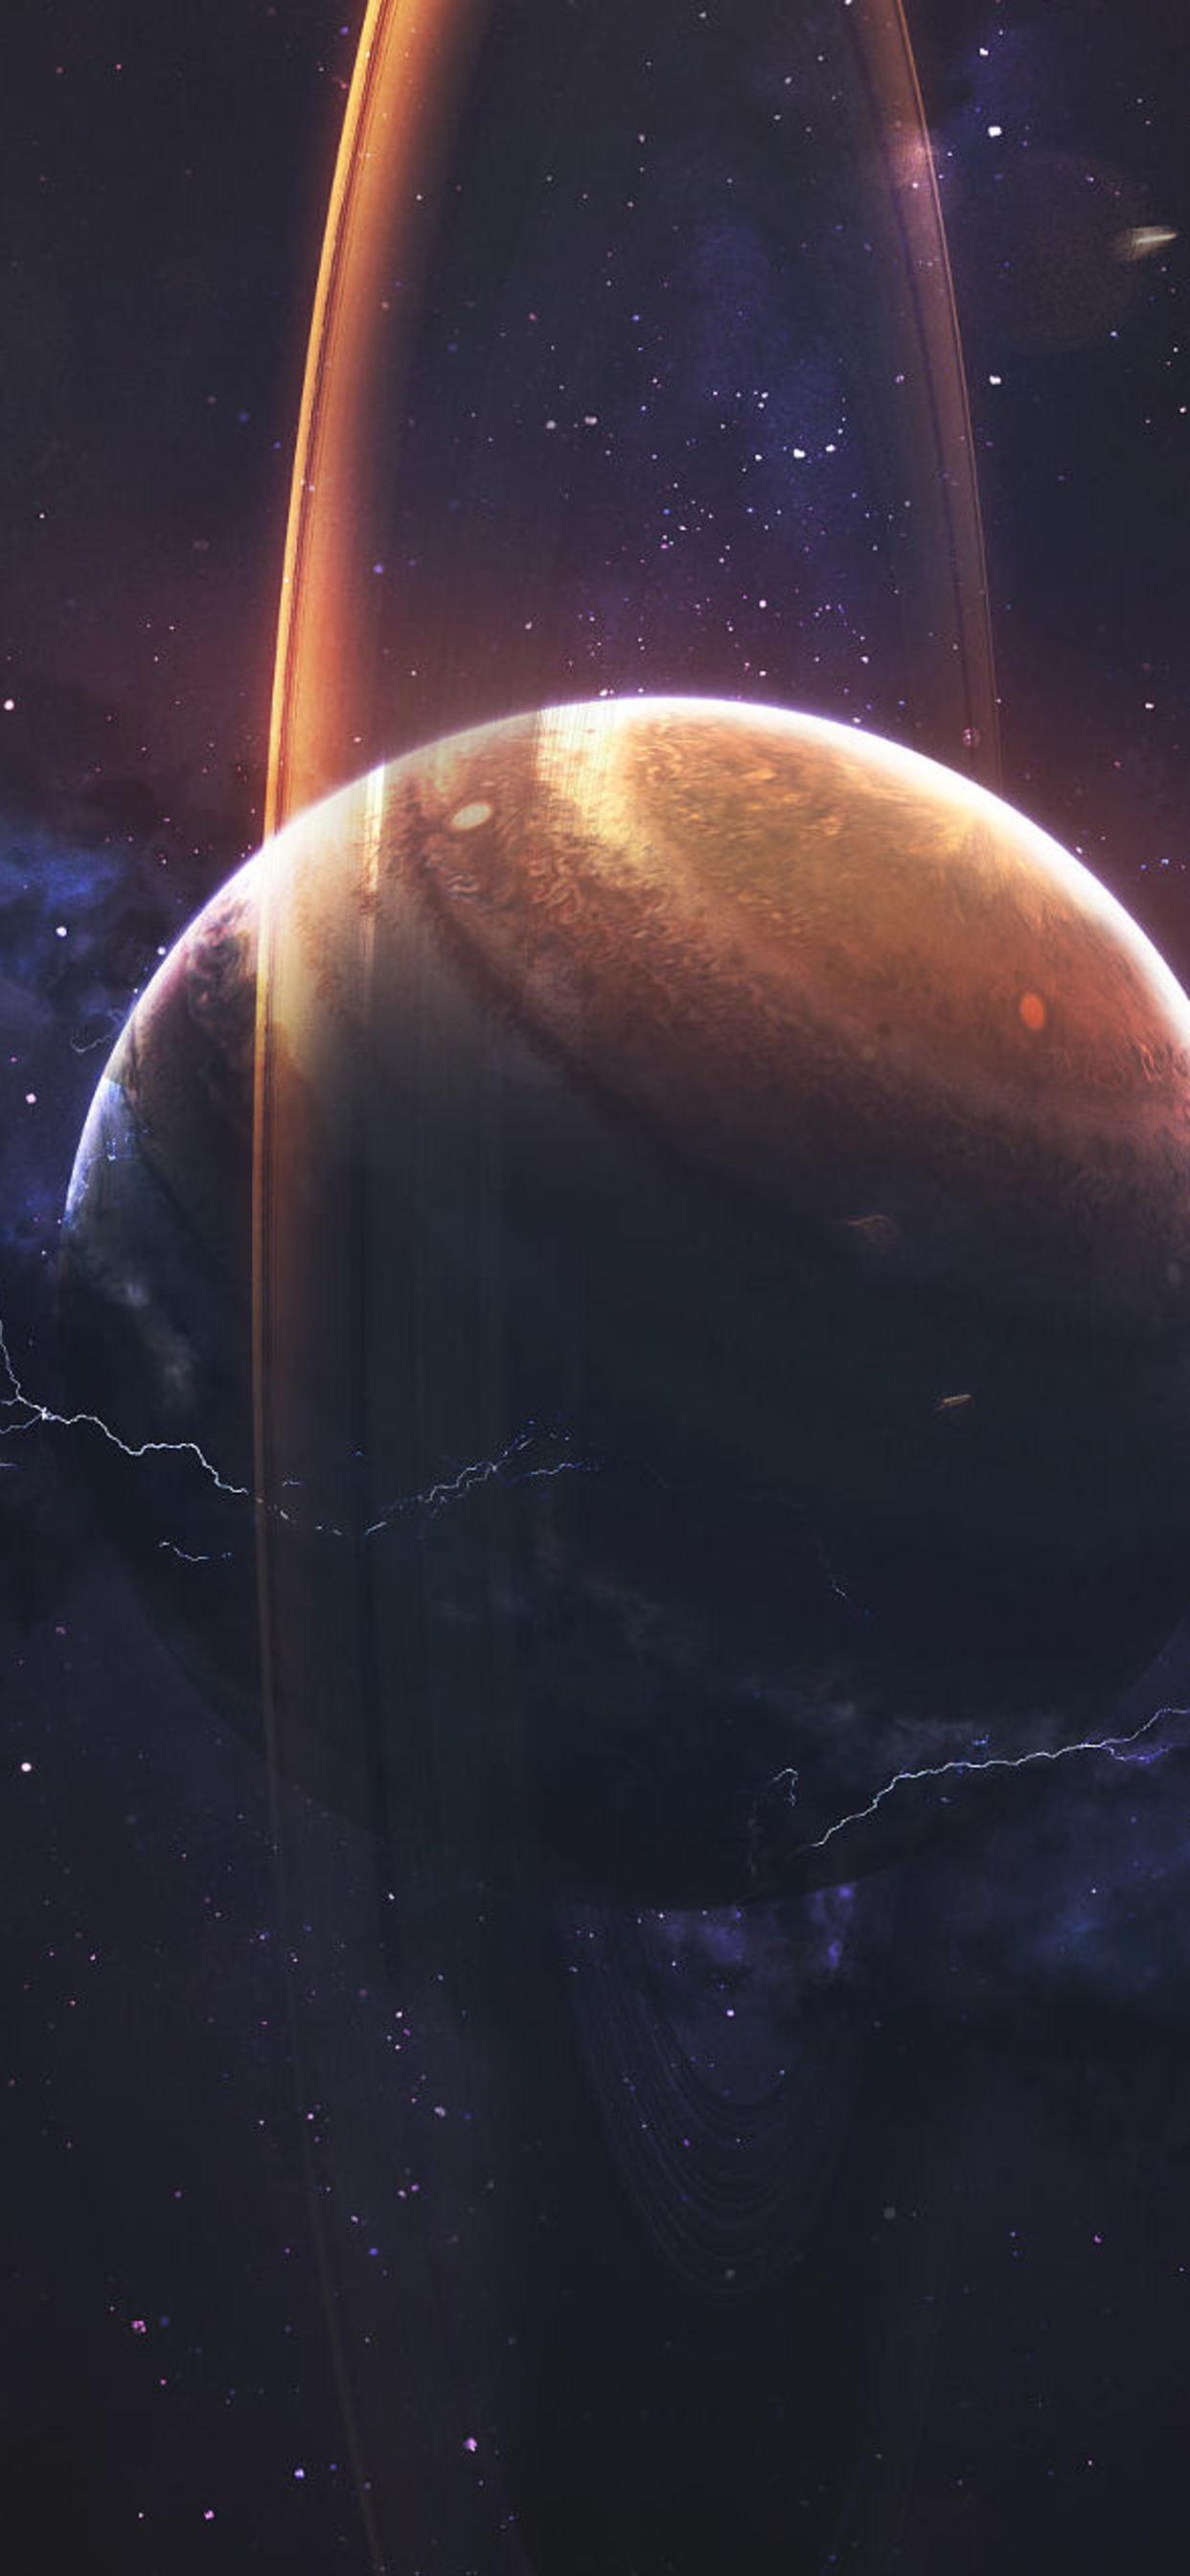 Deep Space Wallpaper 4k Posted By Ryan Sellers